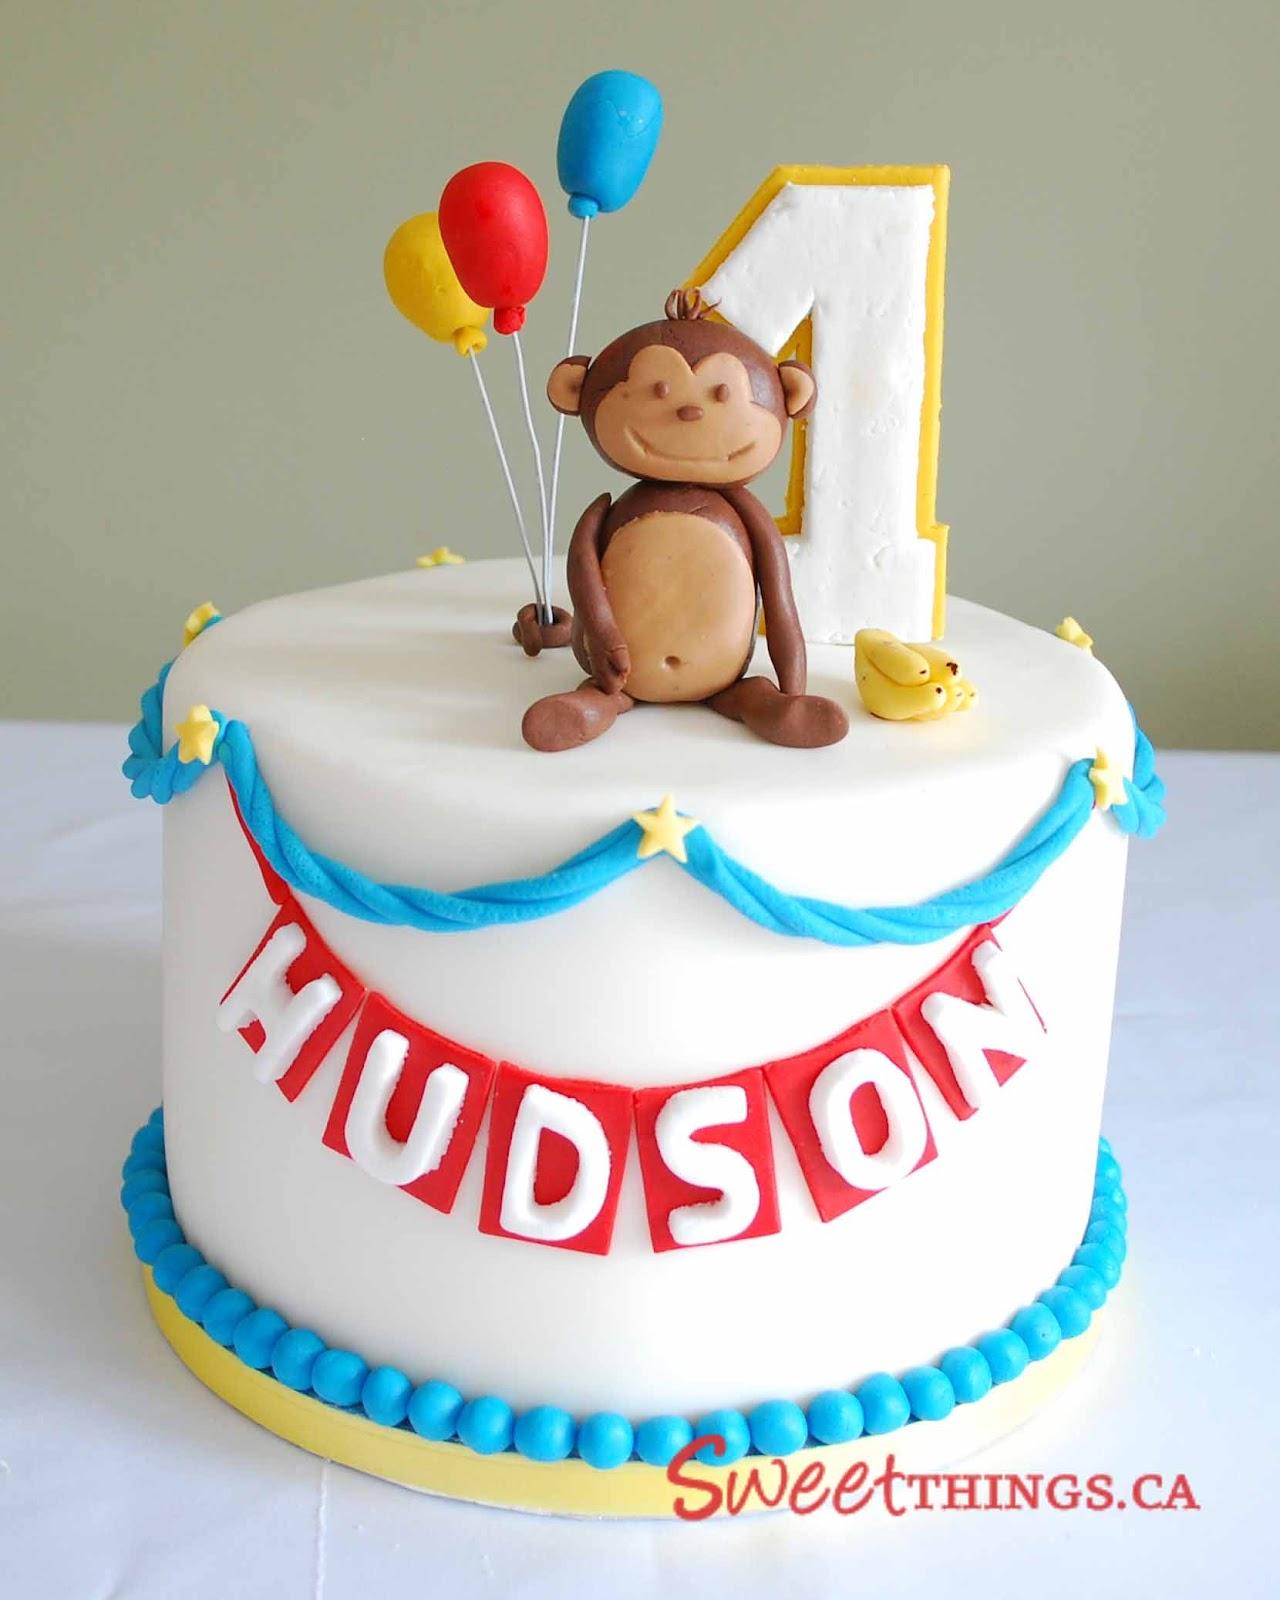 Groovy 13 First Birthday Monkey Love Cakes Photo Pink Mod Monkey 1St Personalised Birthday Cards Petedlily Jamesorg